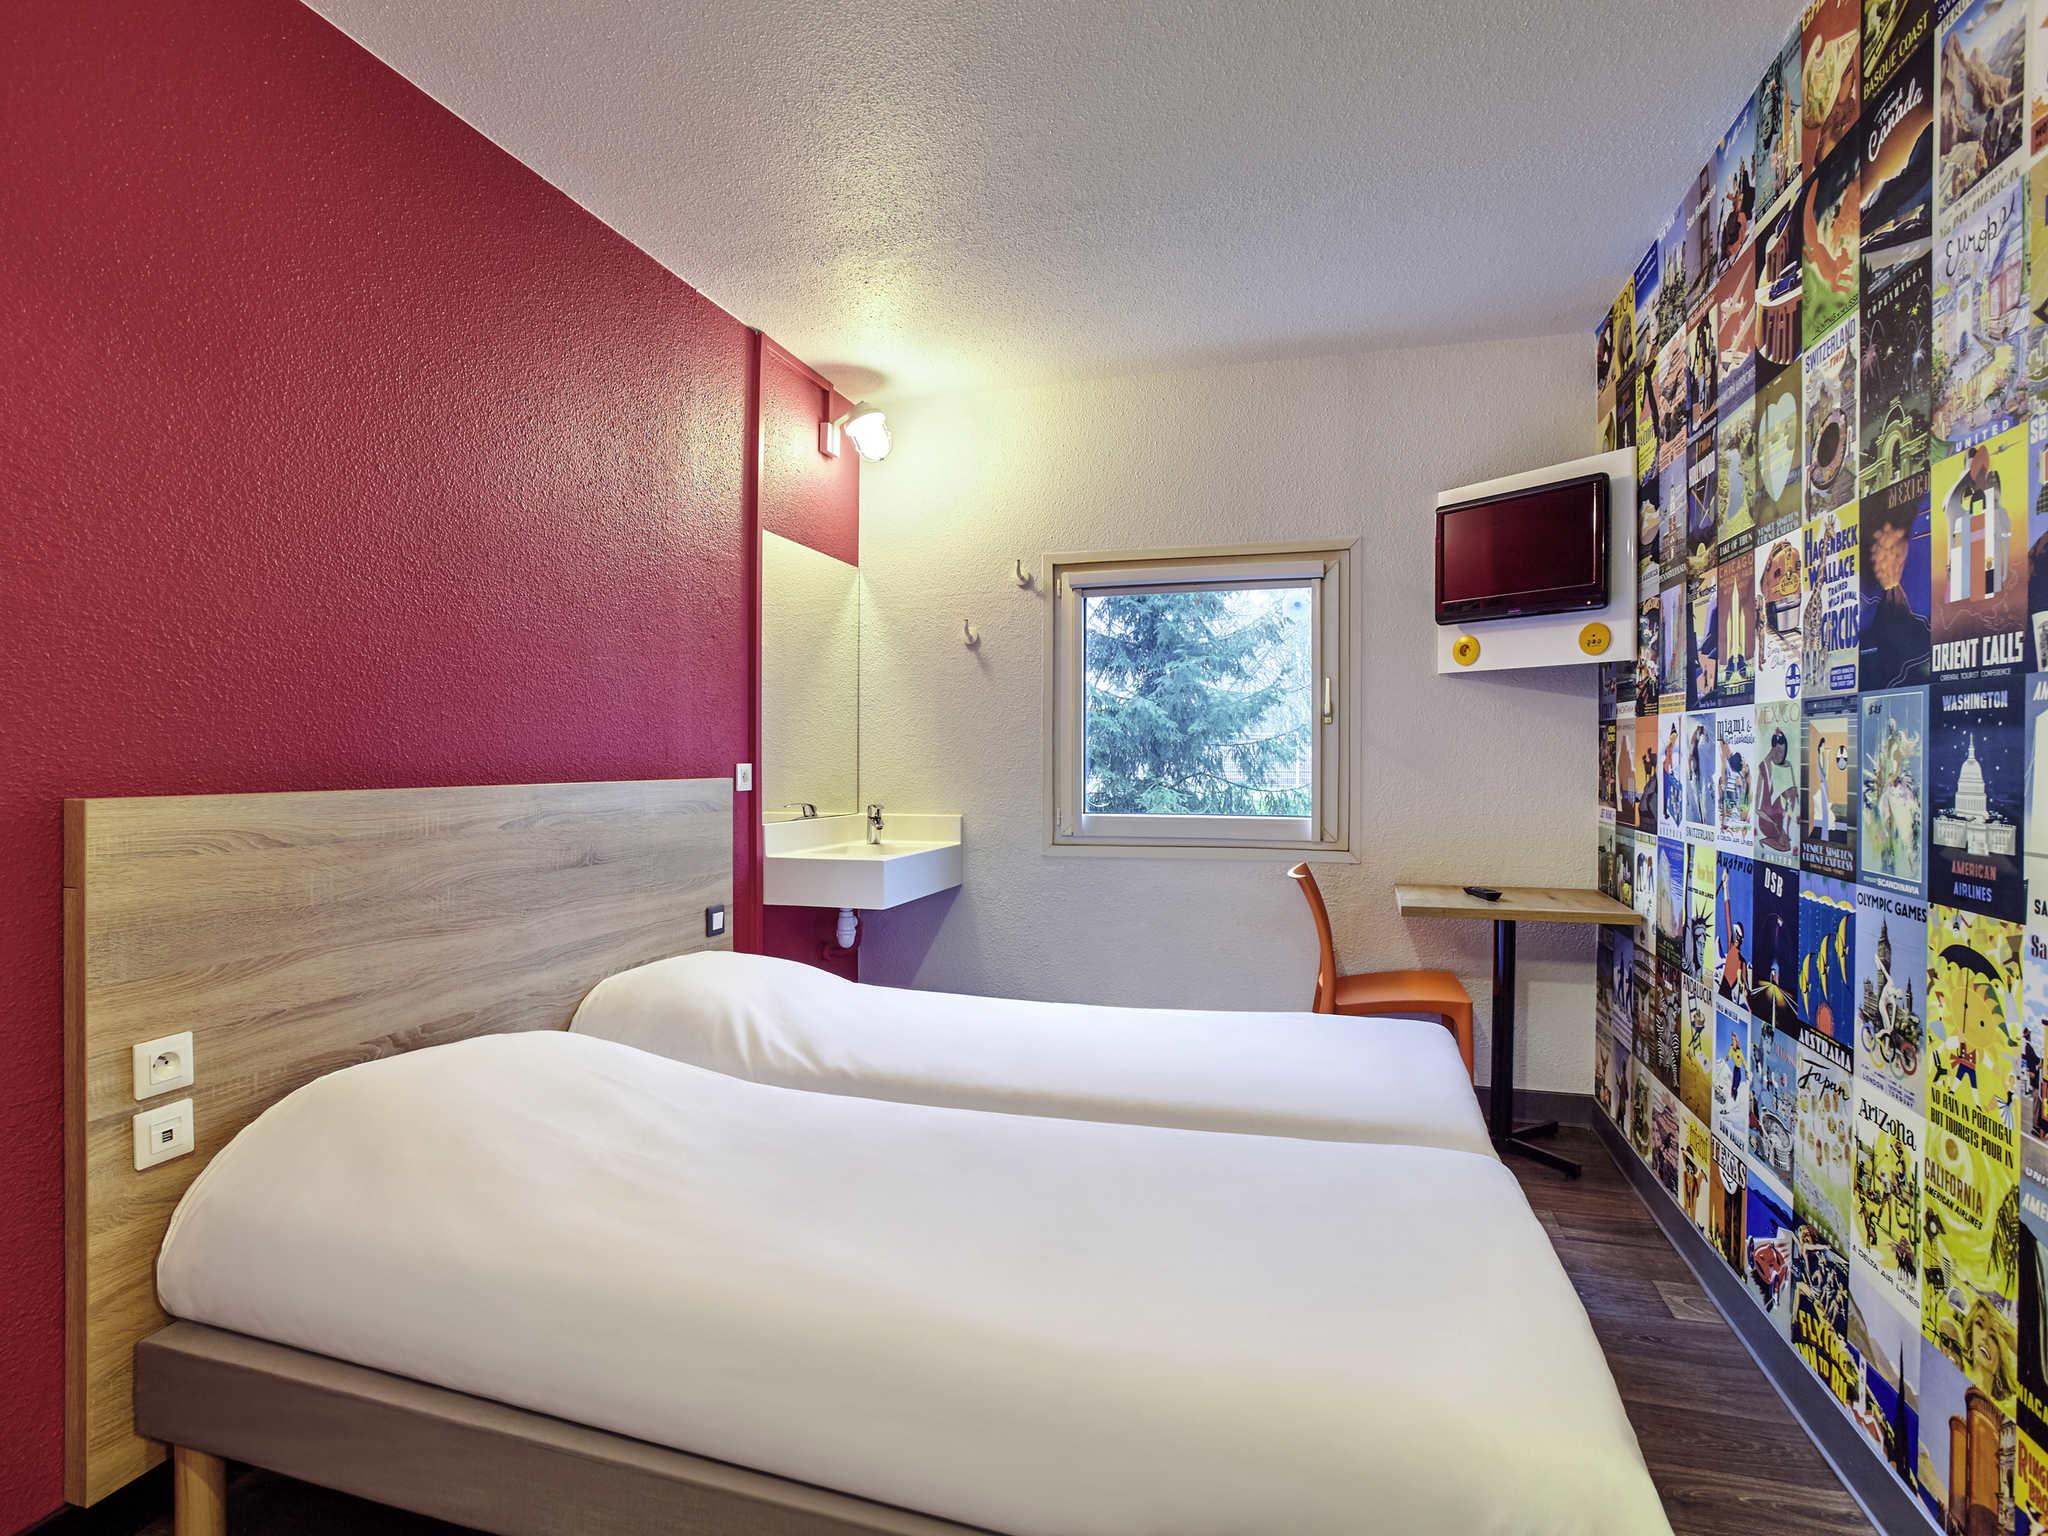 Hotel - hotelF1 Brétigny sur Orge